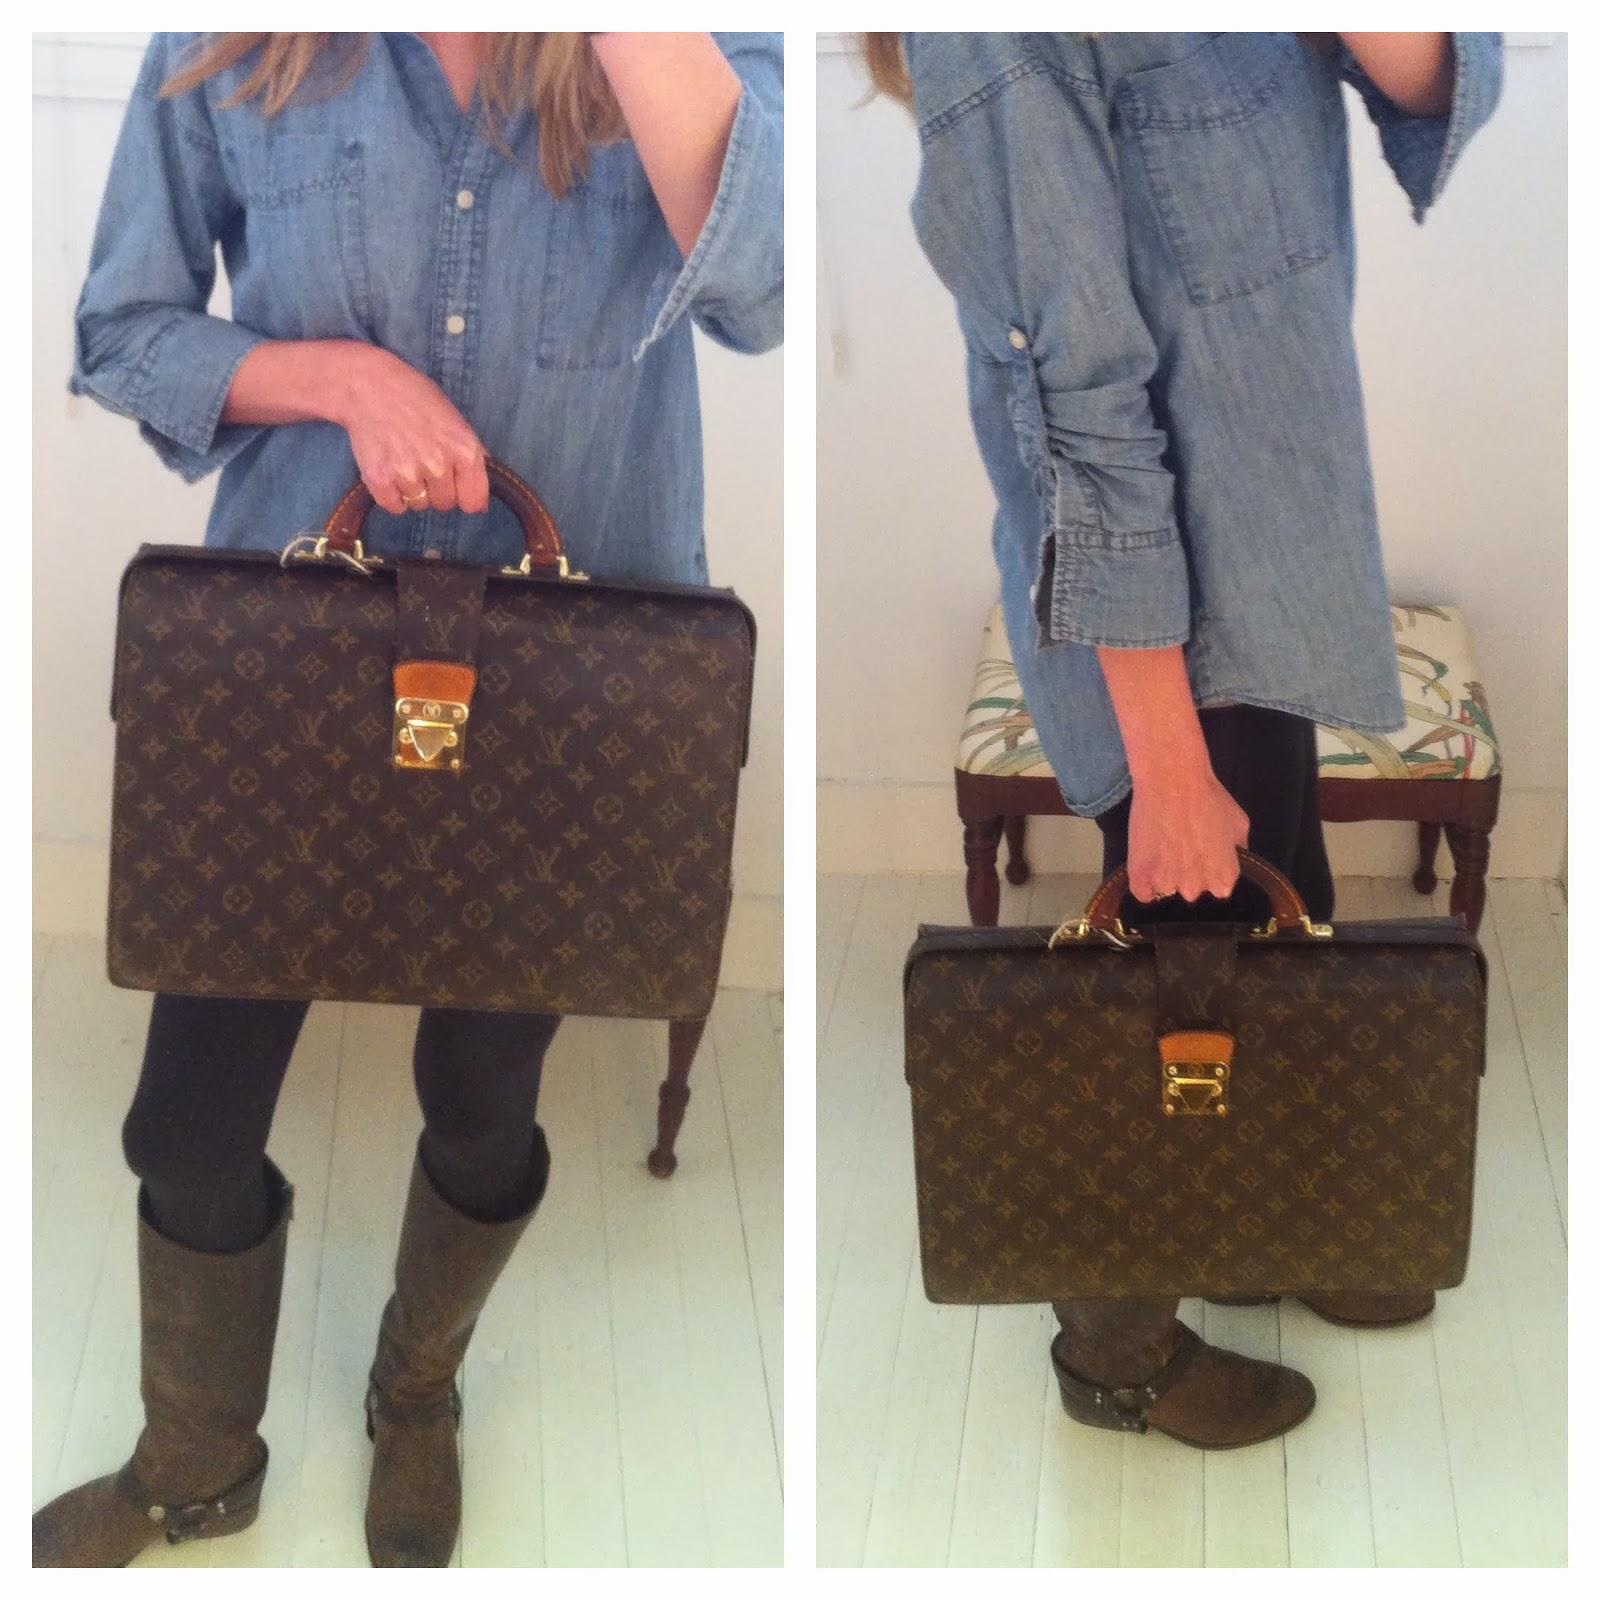 ad2efbf0fb35 Fondren Muse  Louis Vuitton Serviette Fermoir Briefcase  1495